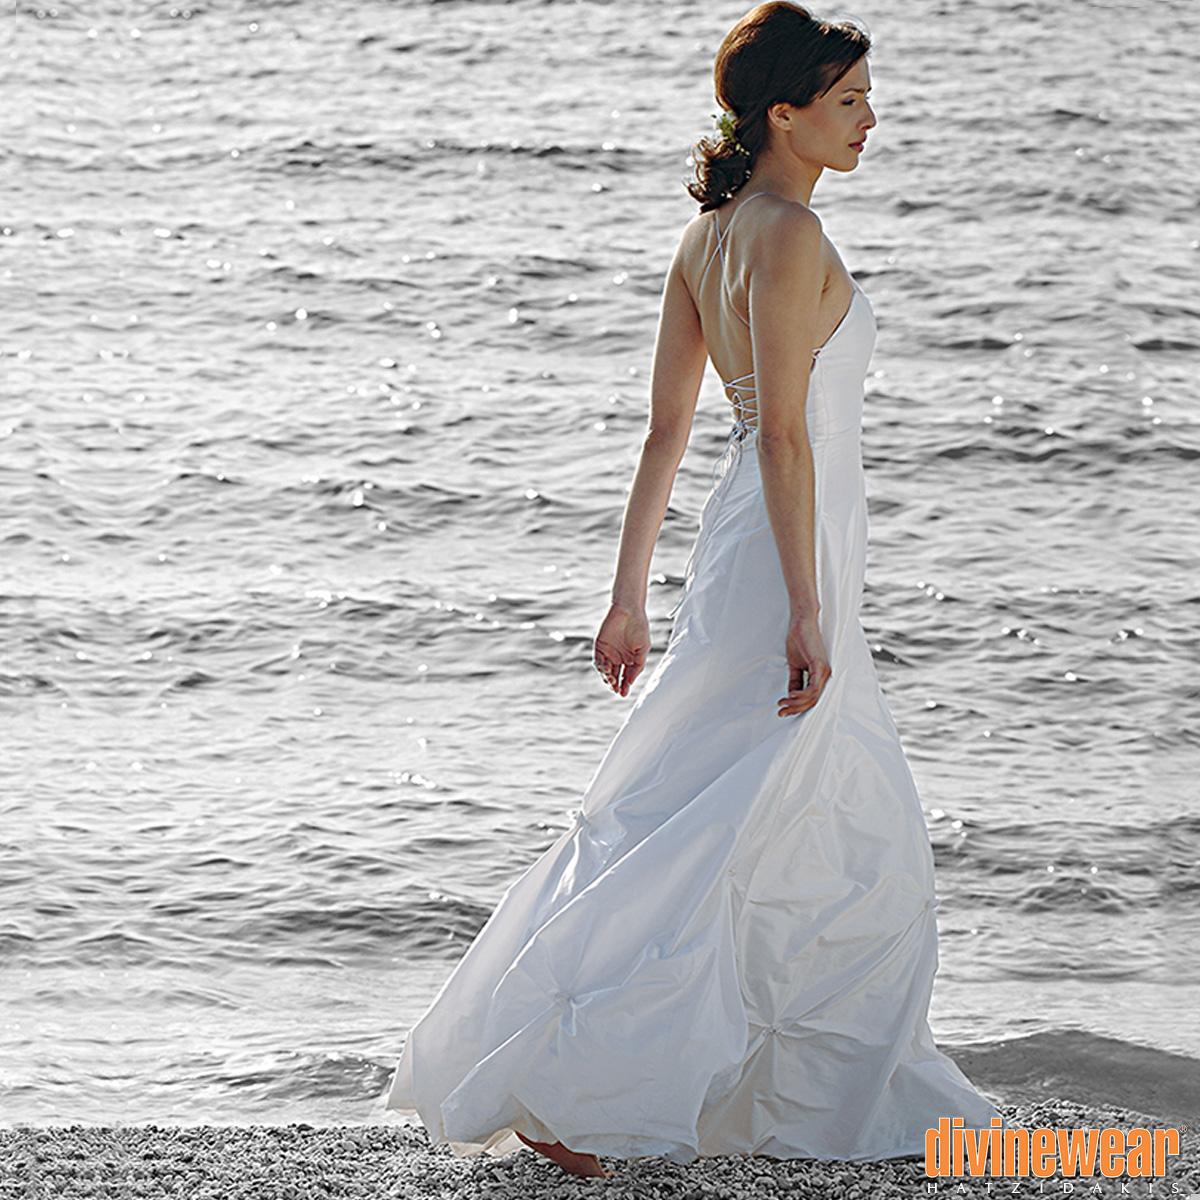 1a6458442c0f Νυφικό φόρεμα